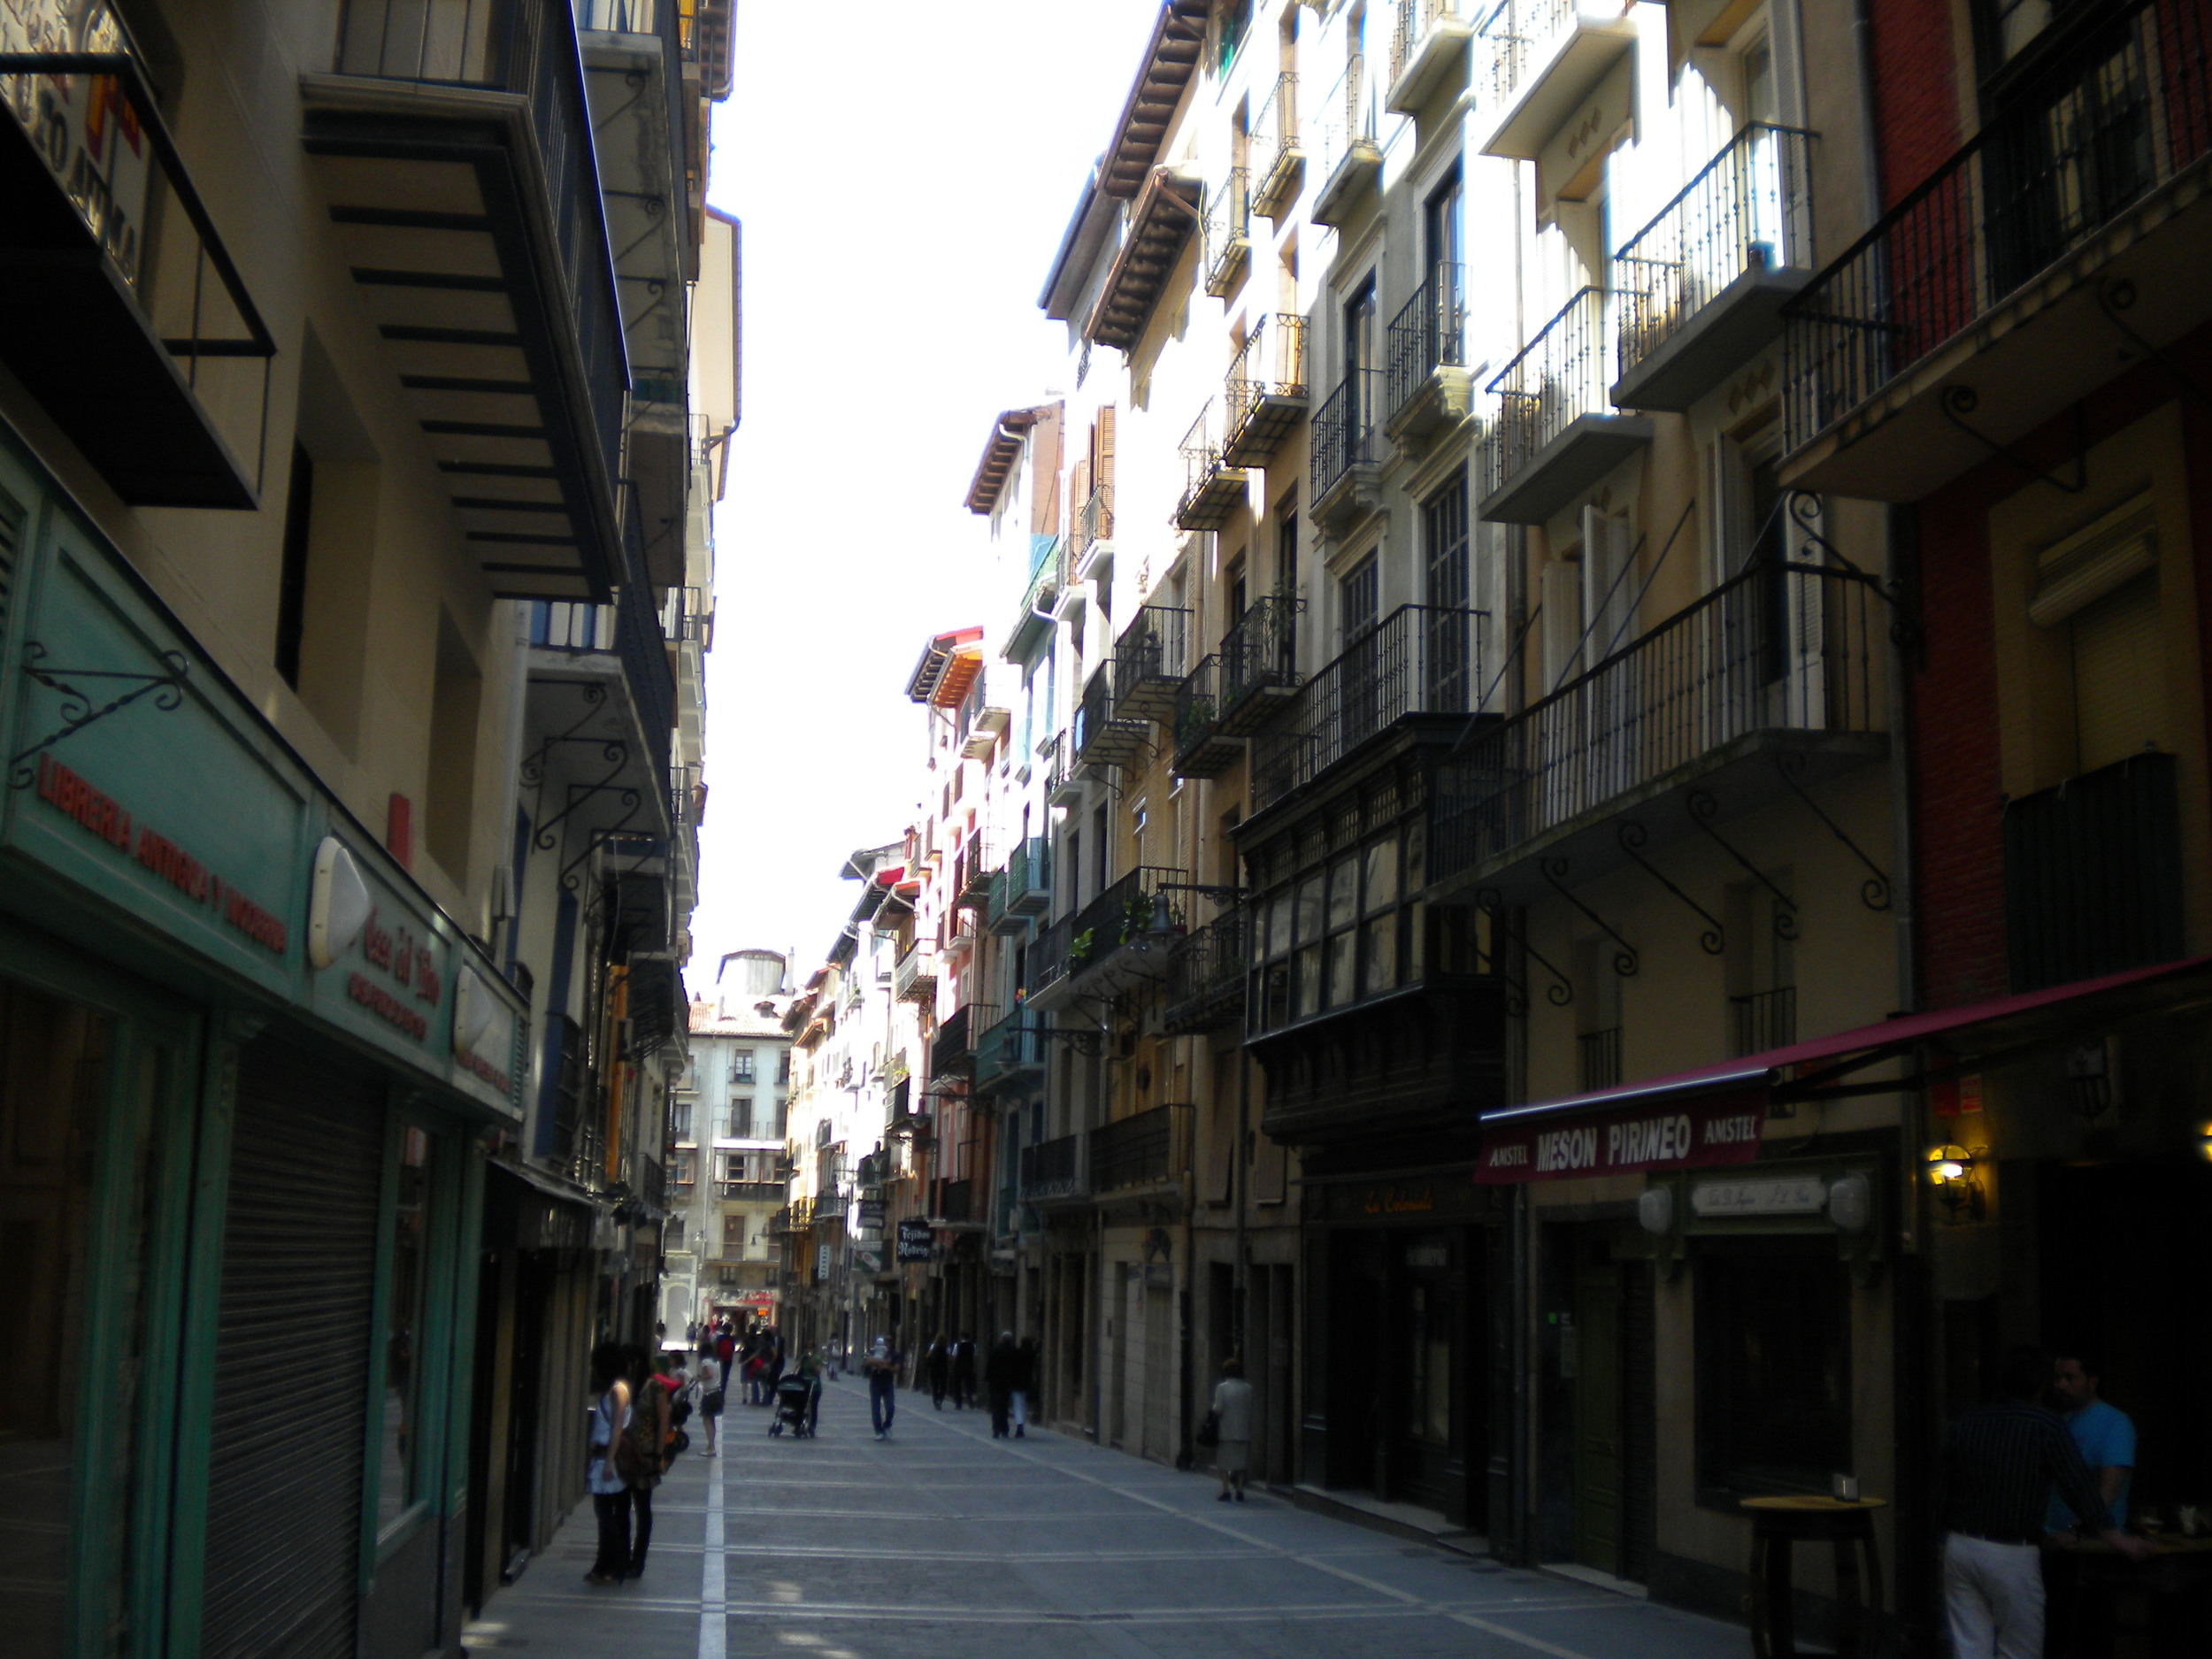 Calle Estafeta, Pamplona/Iruña